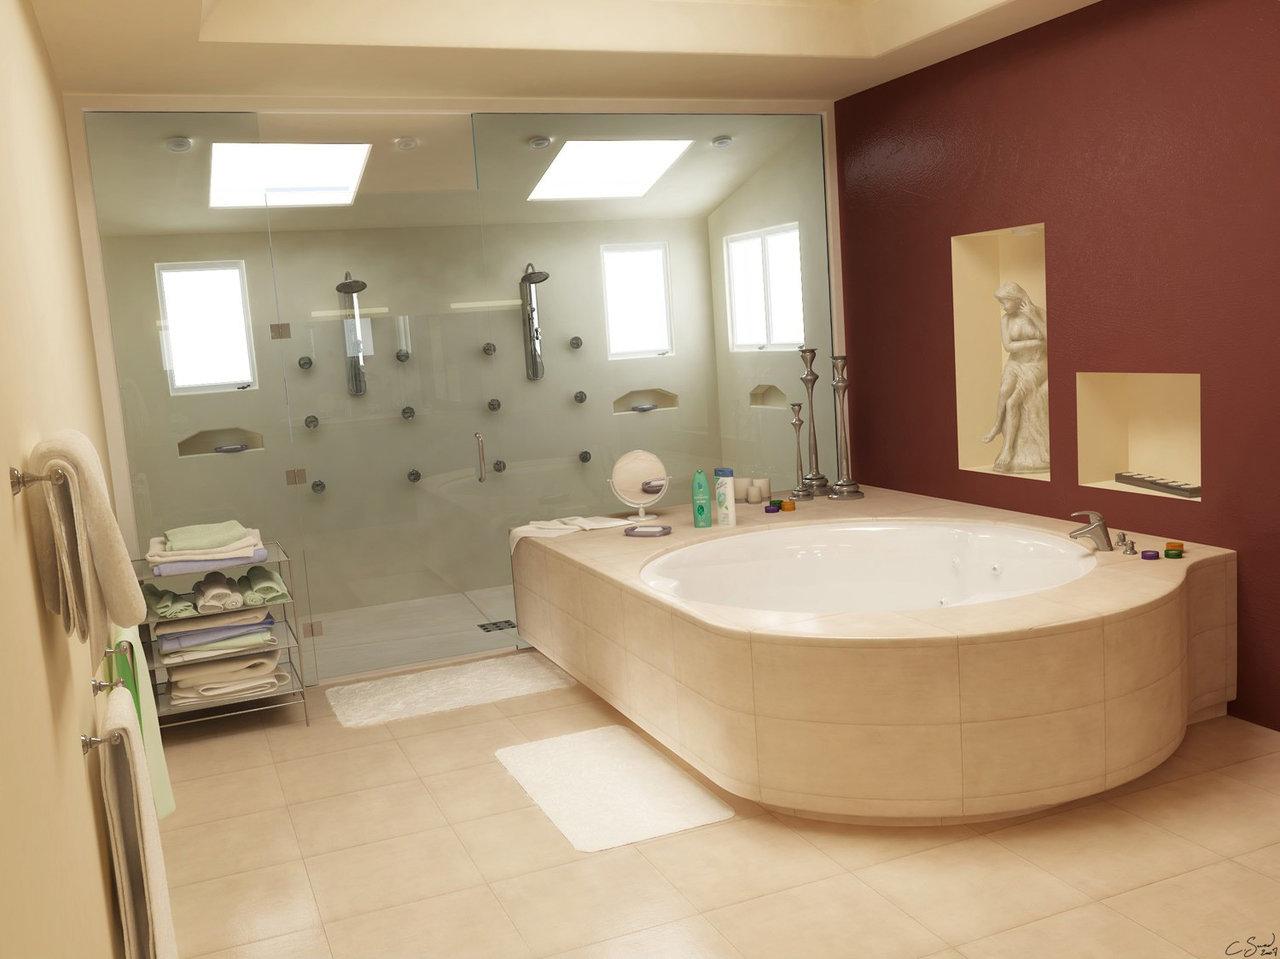 Fancy Small Bathrooms: Luxury Small Bathroom Design Ideas